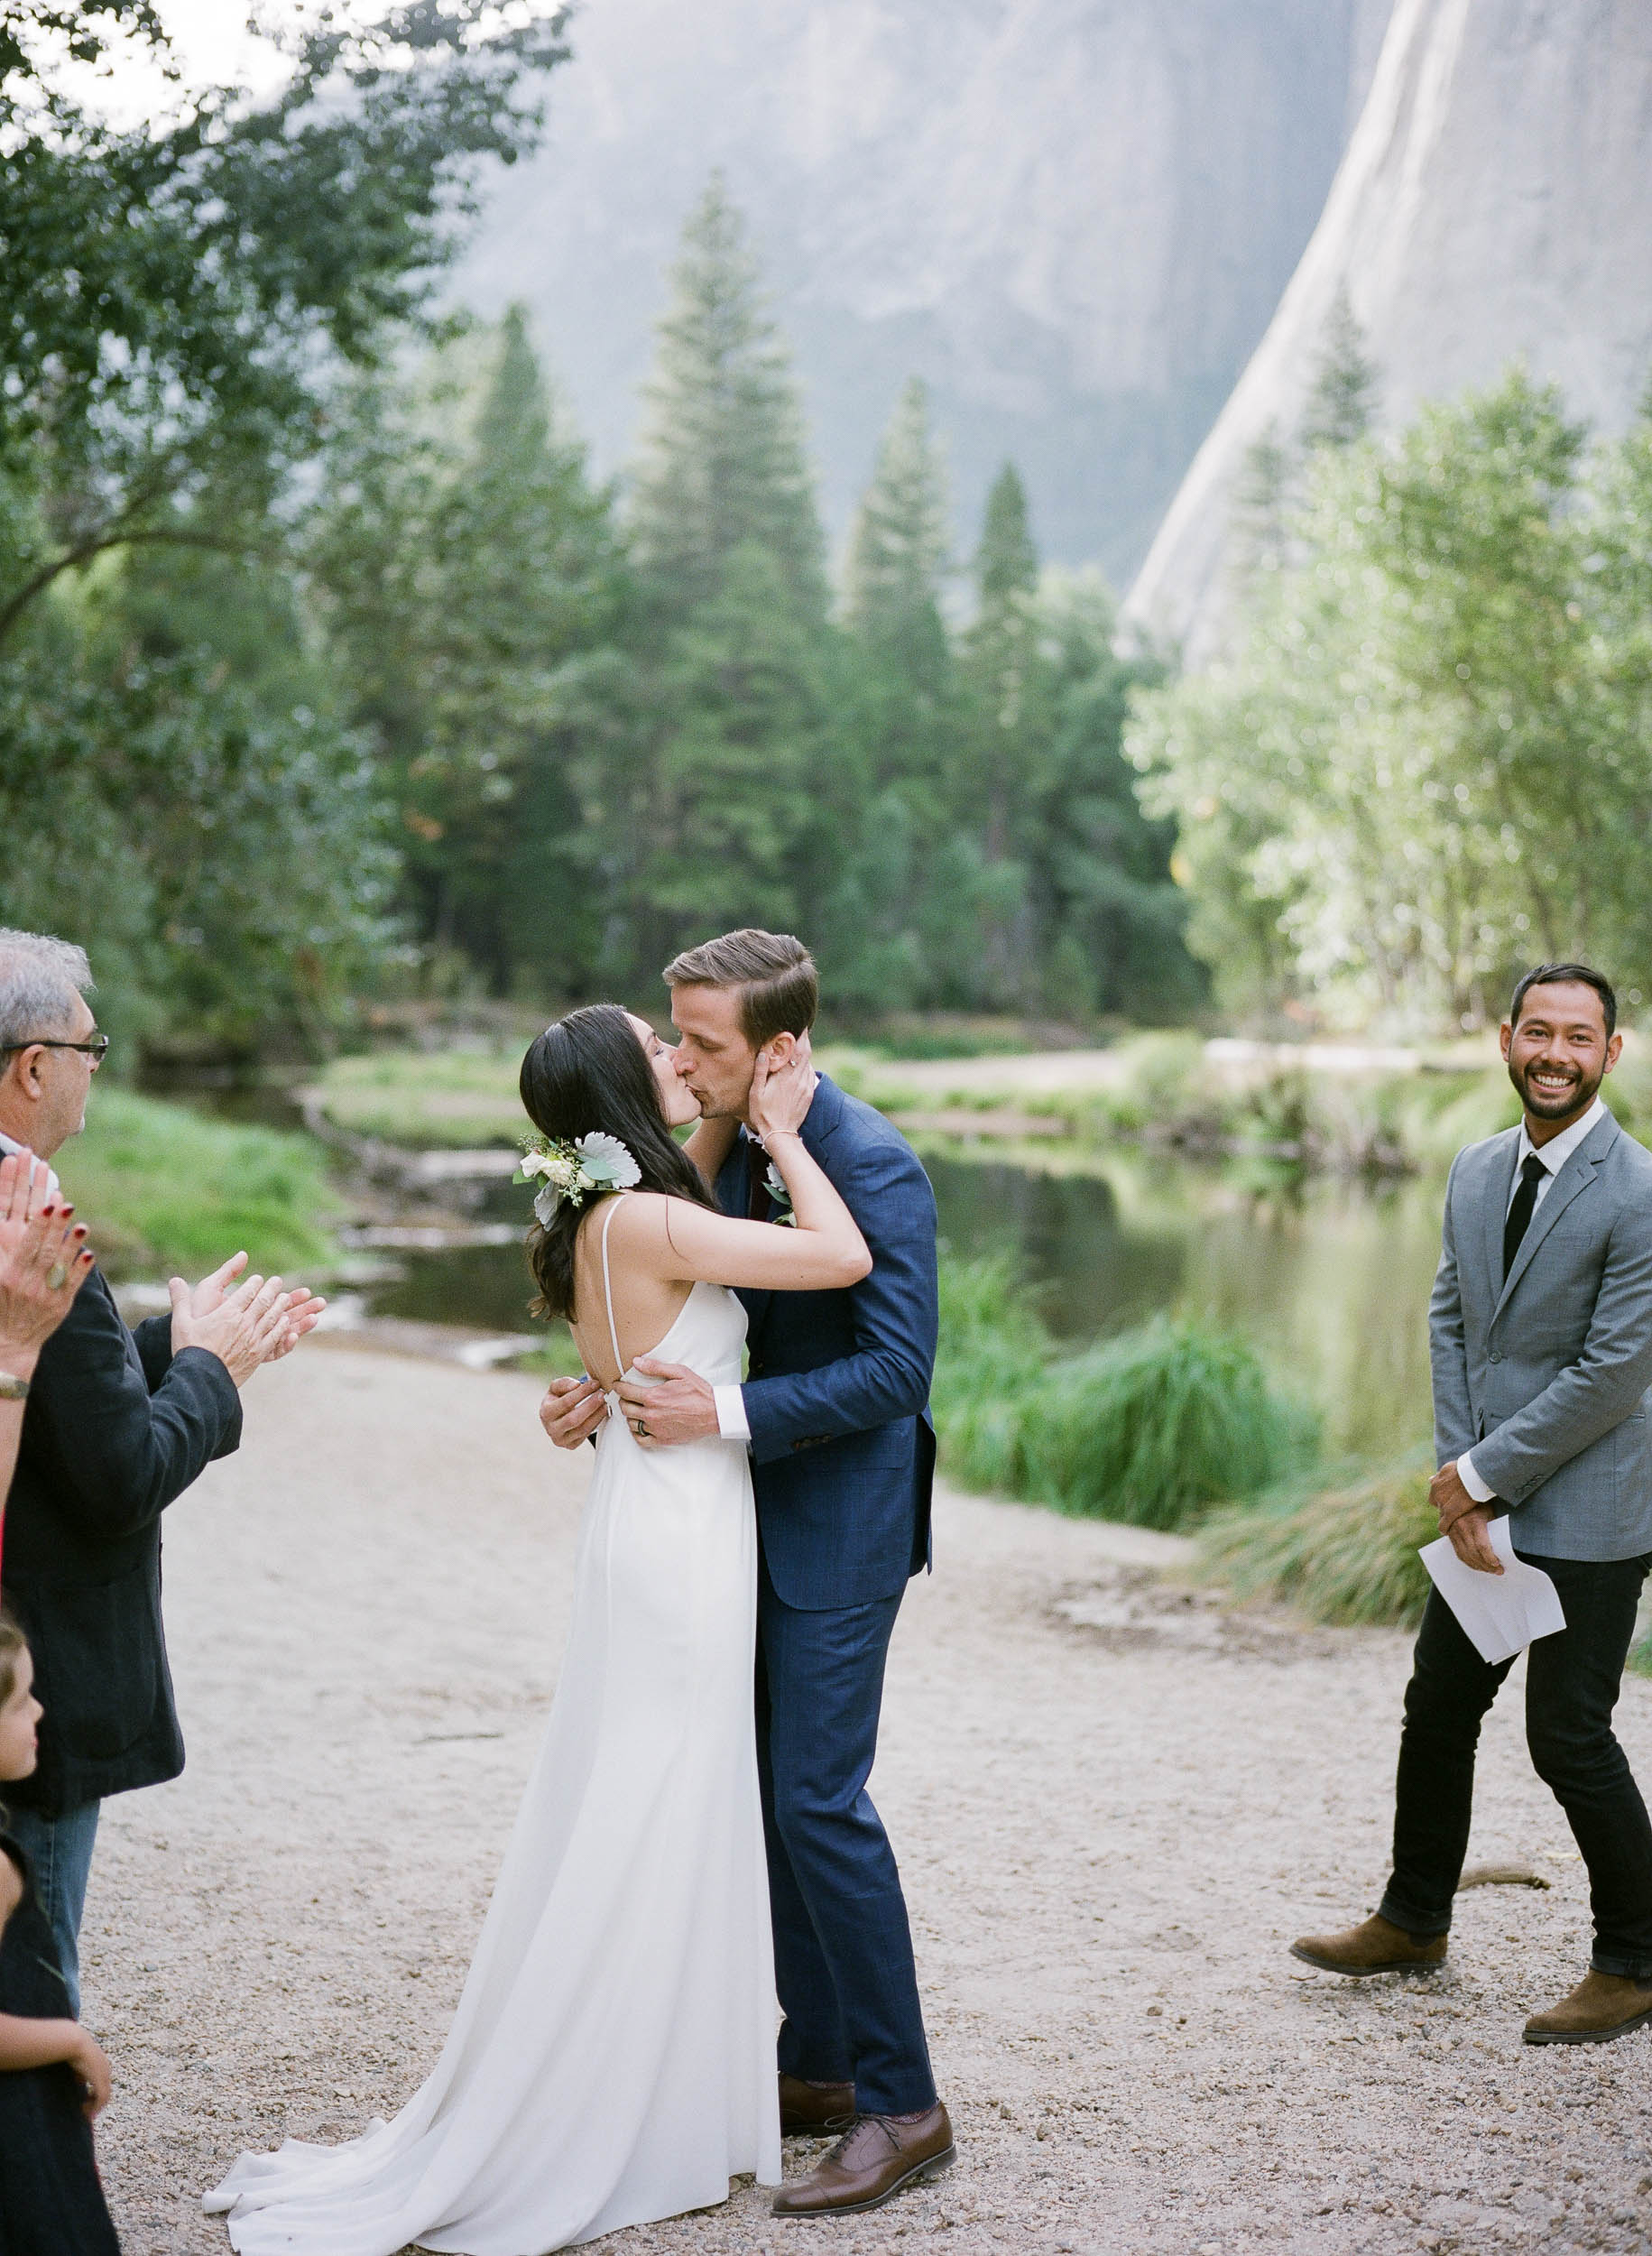 Intimate Yosemite Wedding_Buena Lane Photography_000063820007-3.jpg